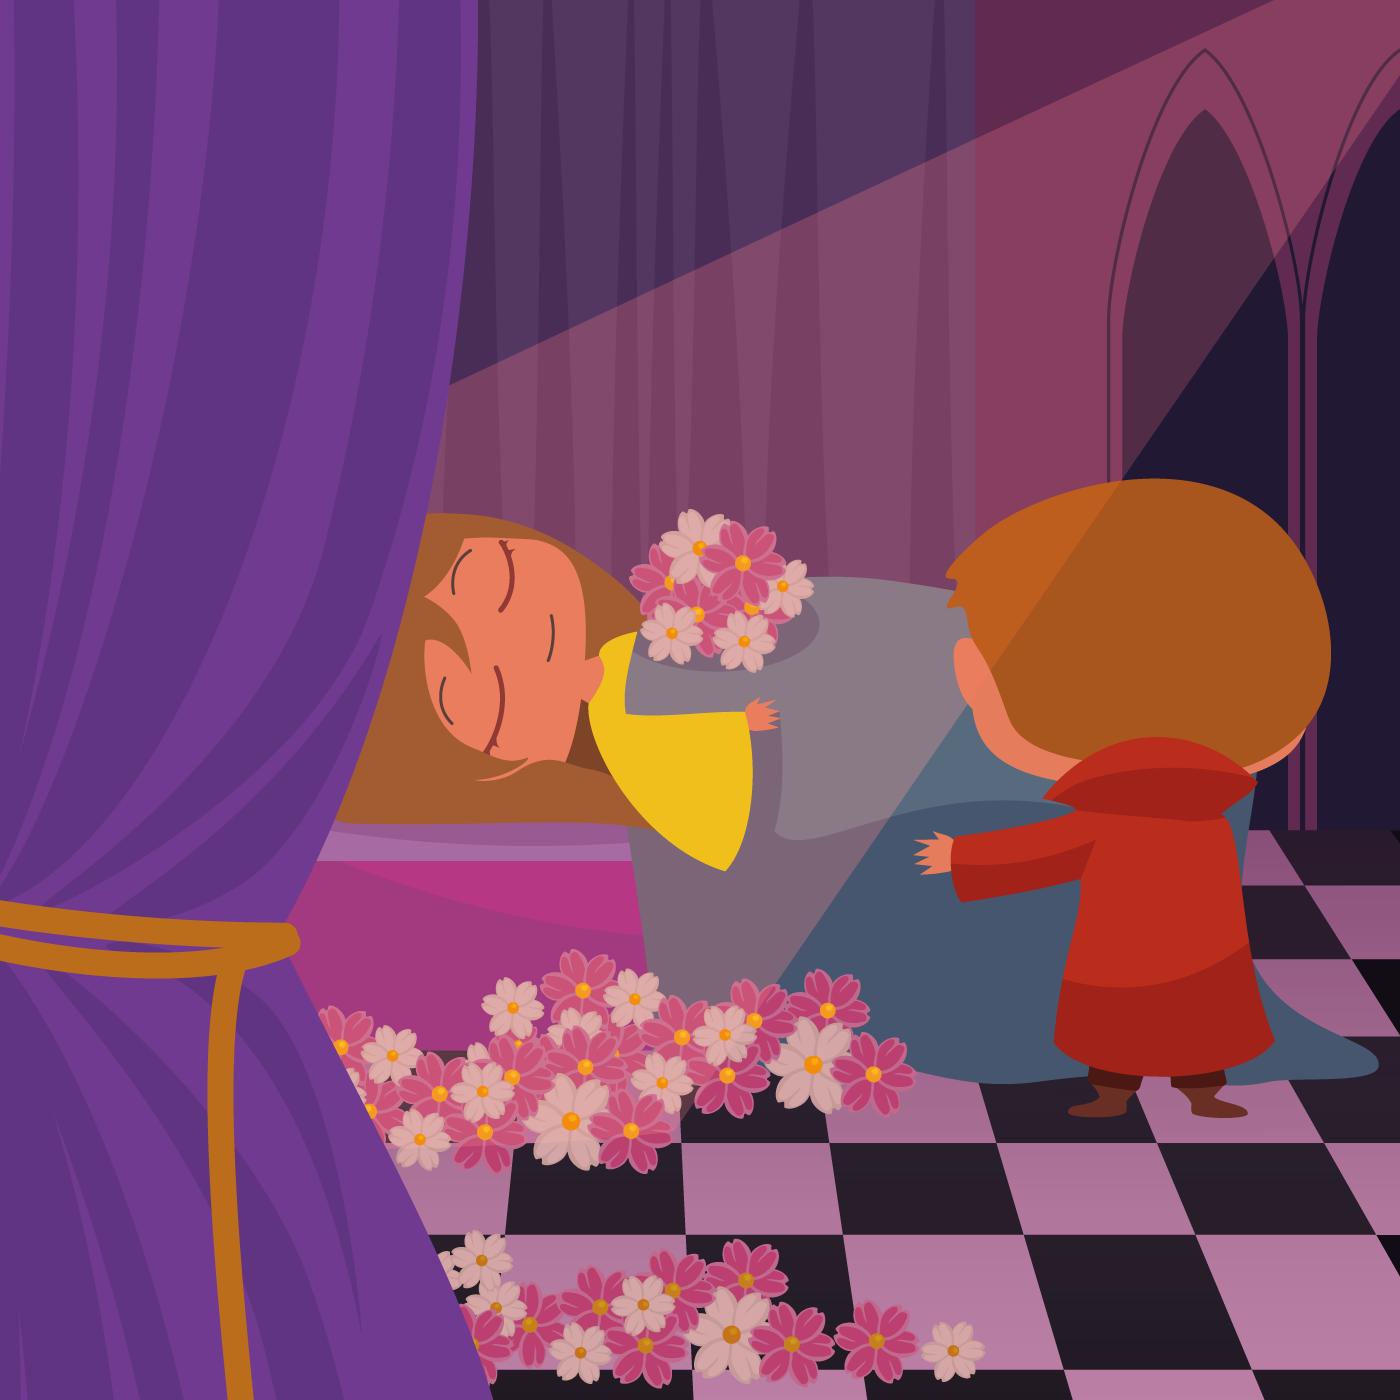 Sleeping Beauty 👸🏼- Part 1